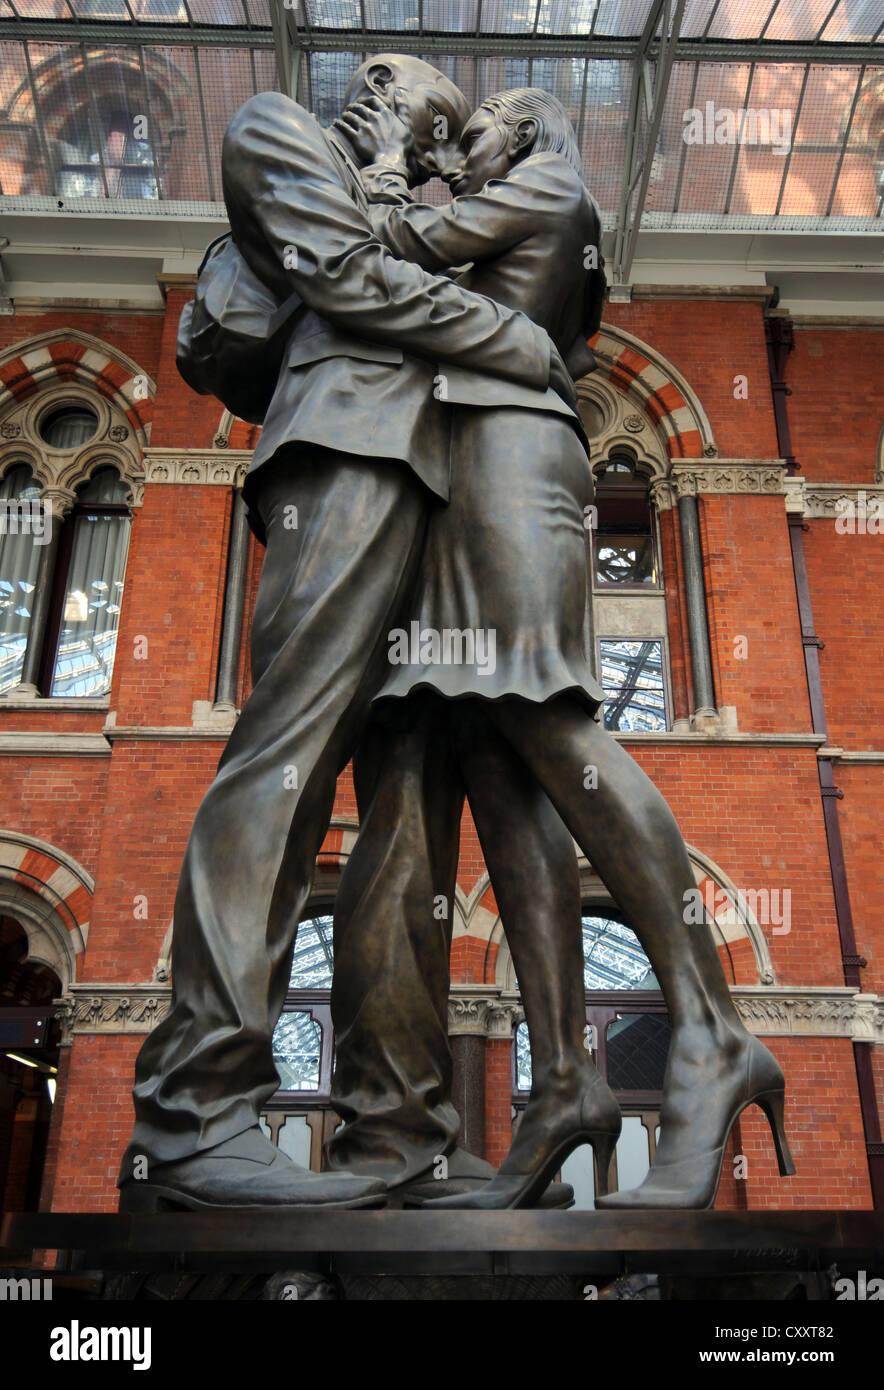 St. Pancras Station, The Meeting Place Statue, St. Pancras Station, London, England, Britain, UK - Stock Image